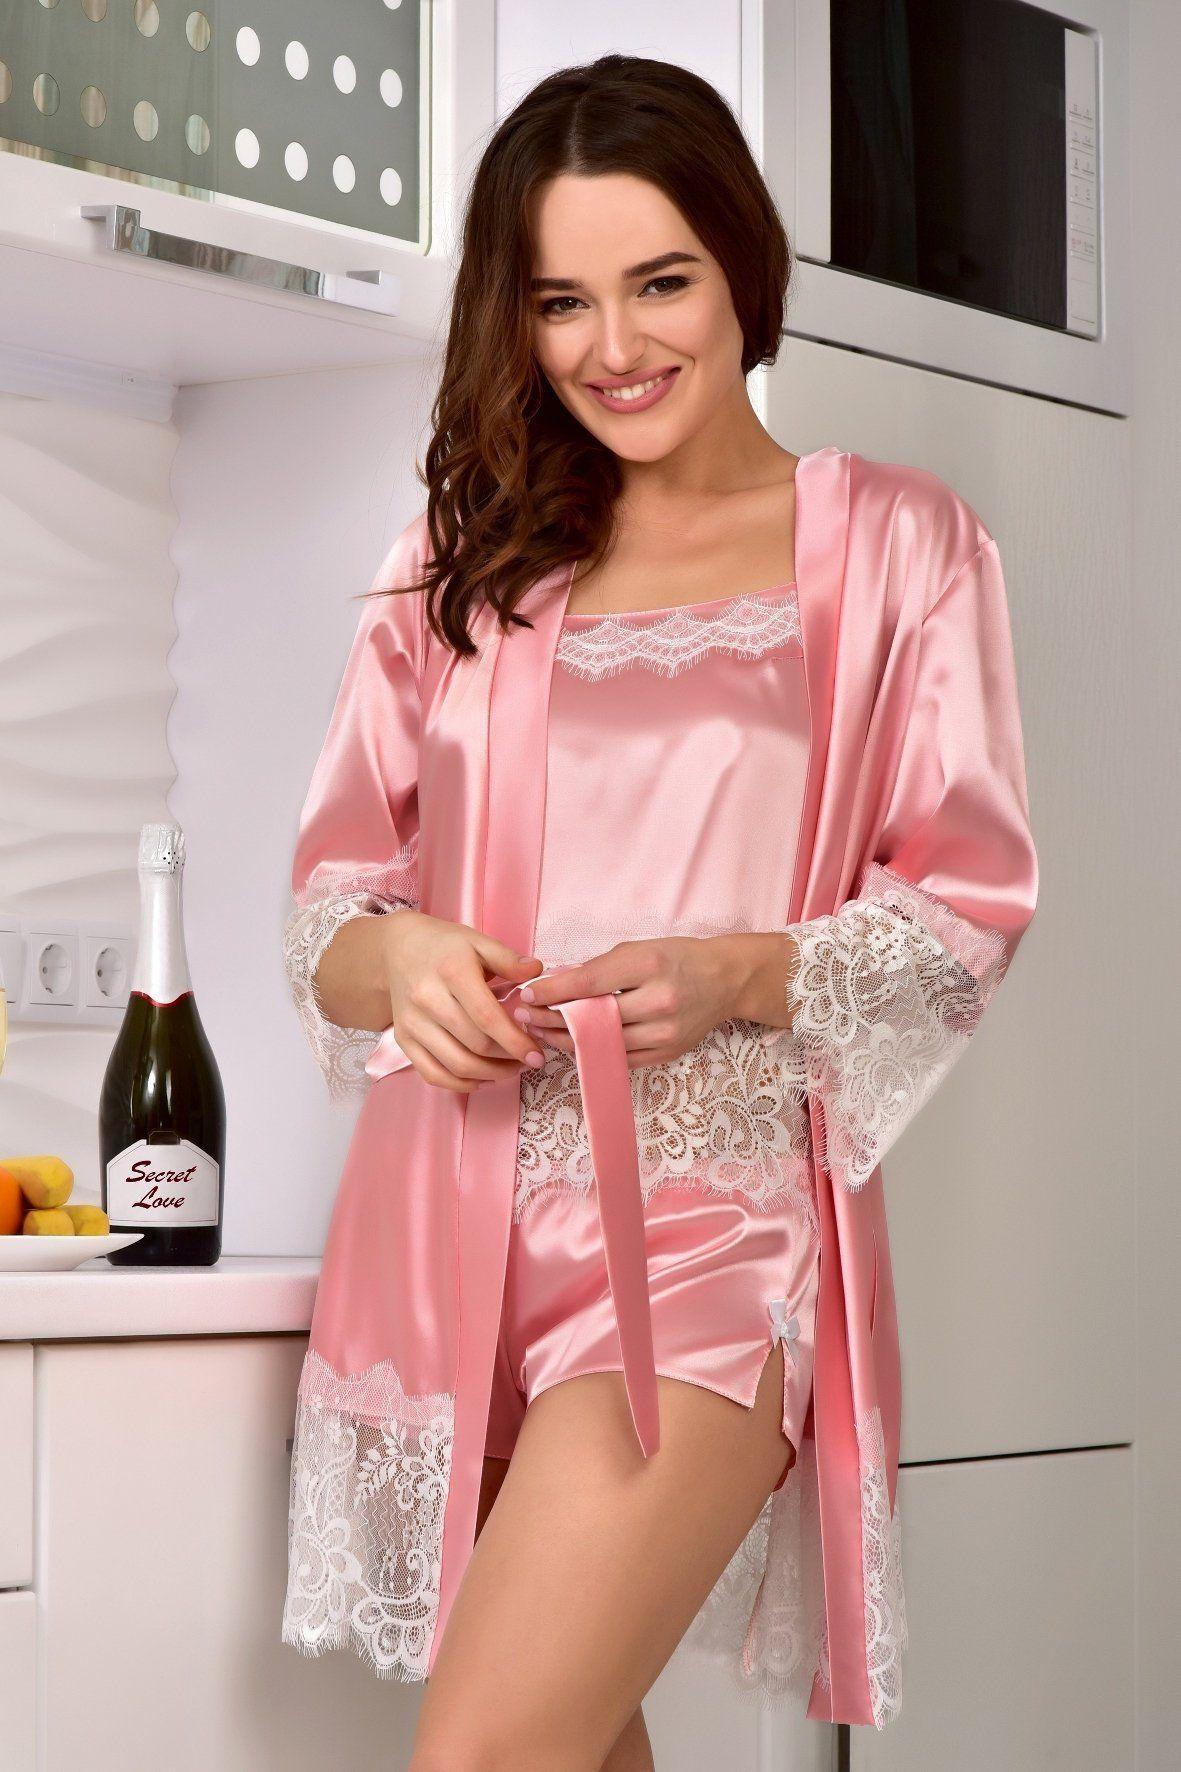 Pink Satin Bow Pyjama Set Nightie Nightwear Lingerie Top Vest Short Sleepwear M